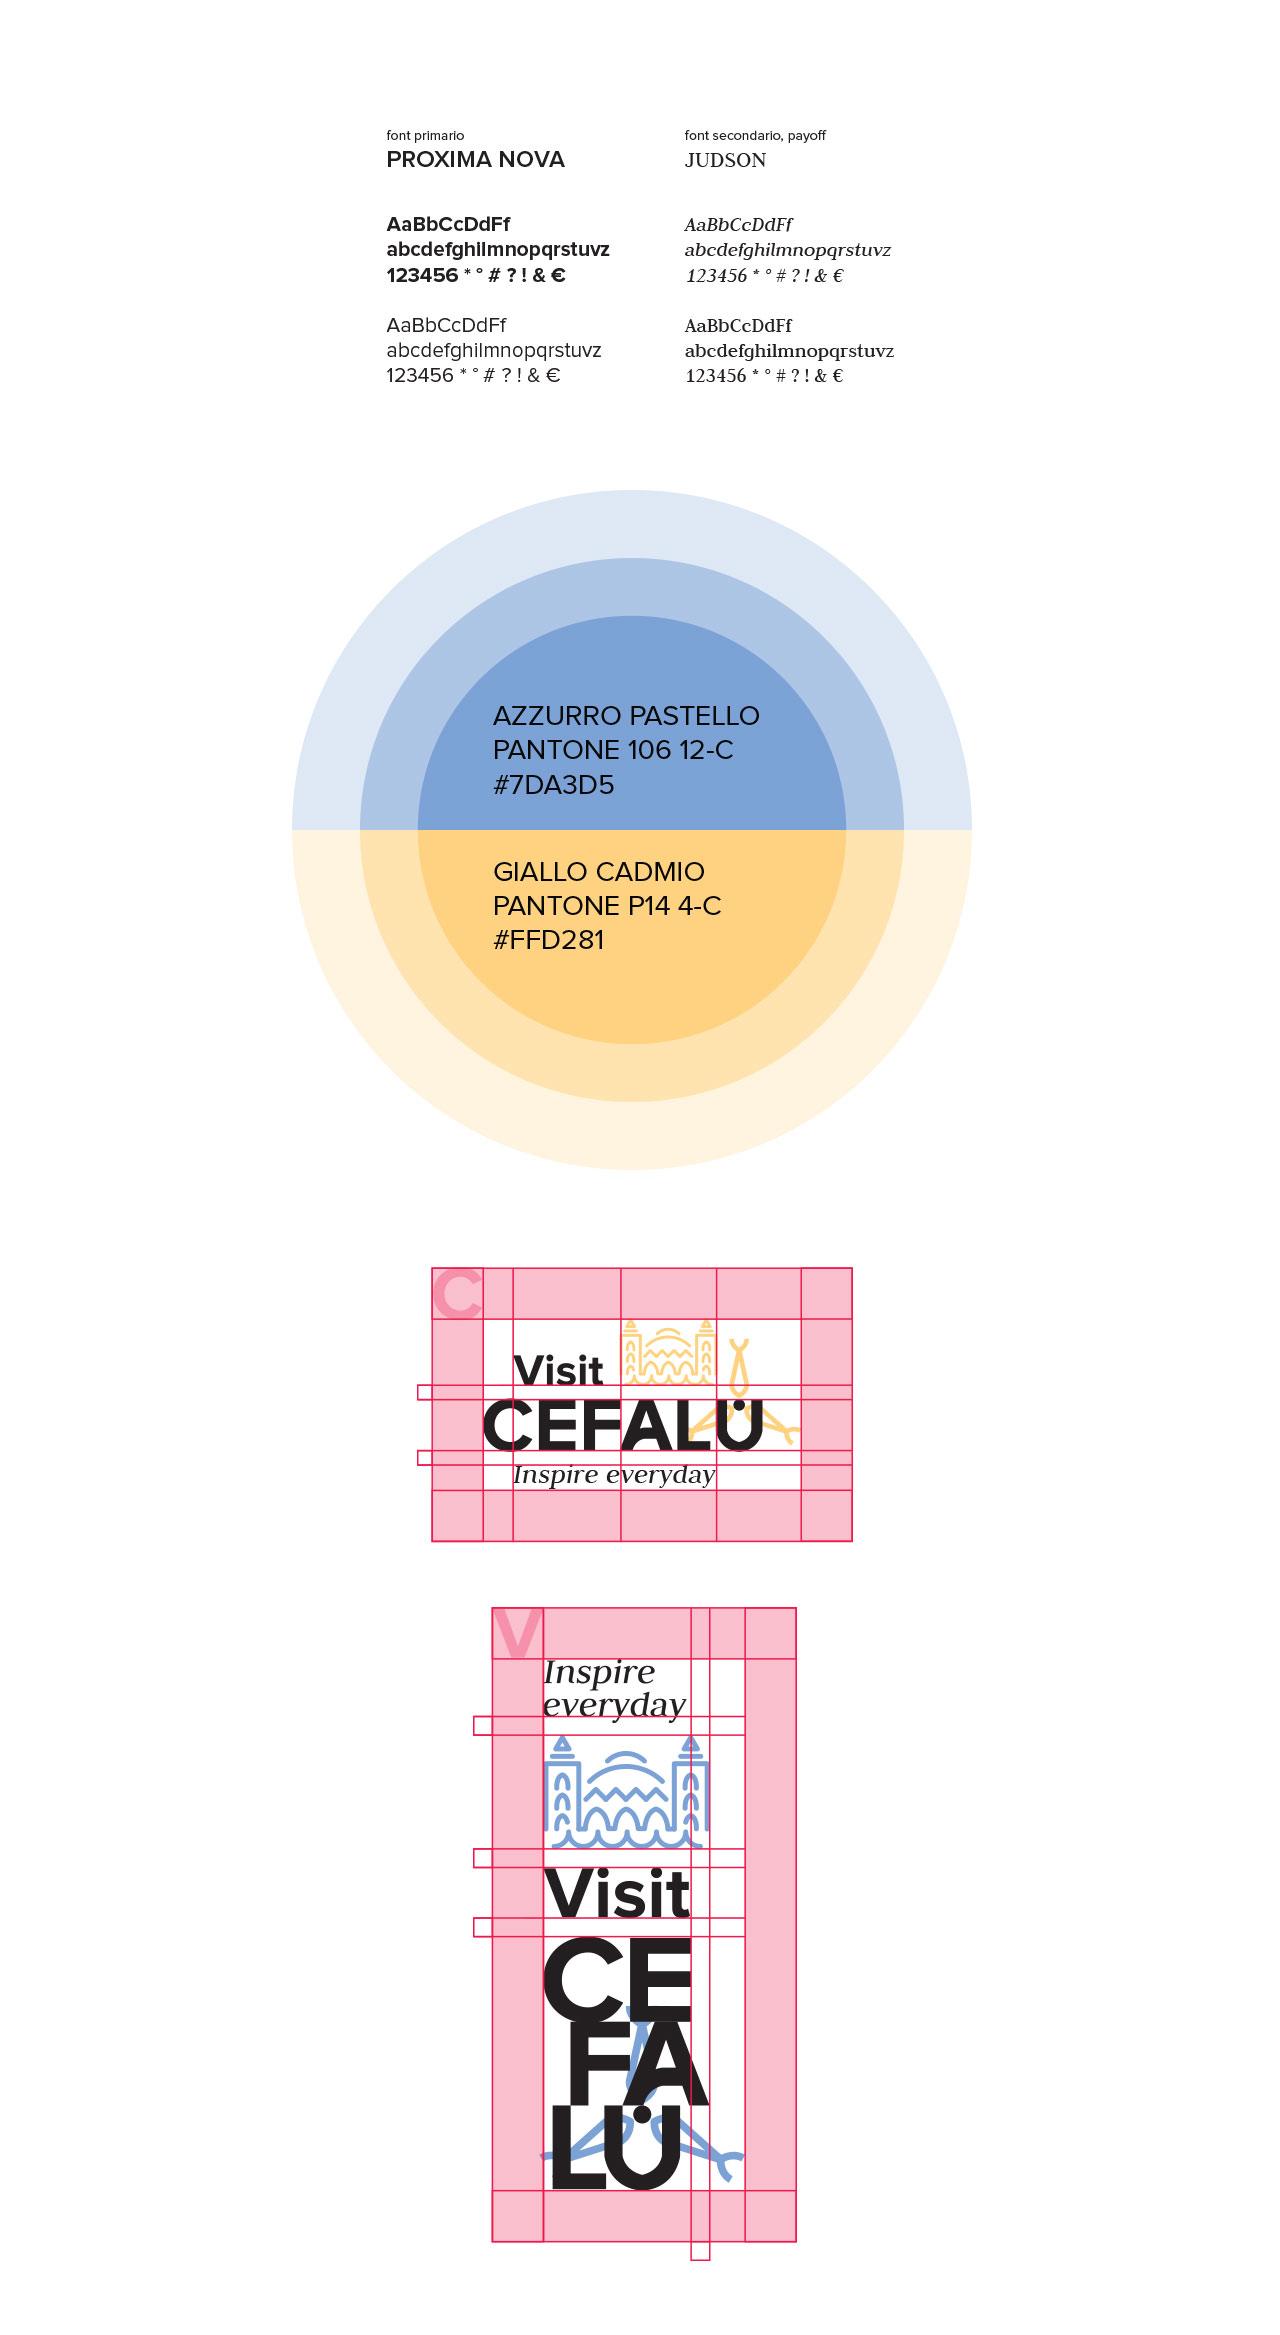 visit cefalu logo chaubet grafico milano 2